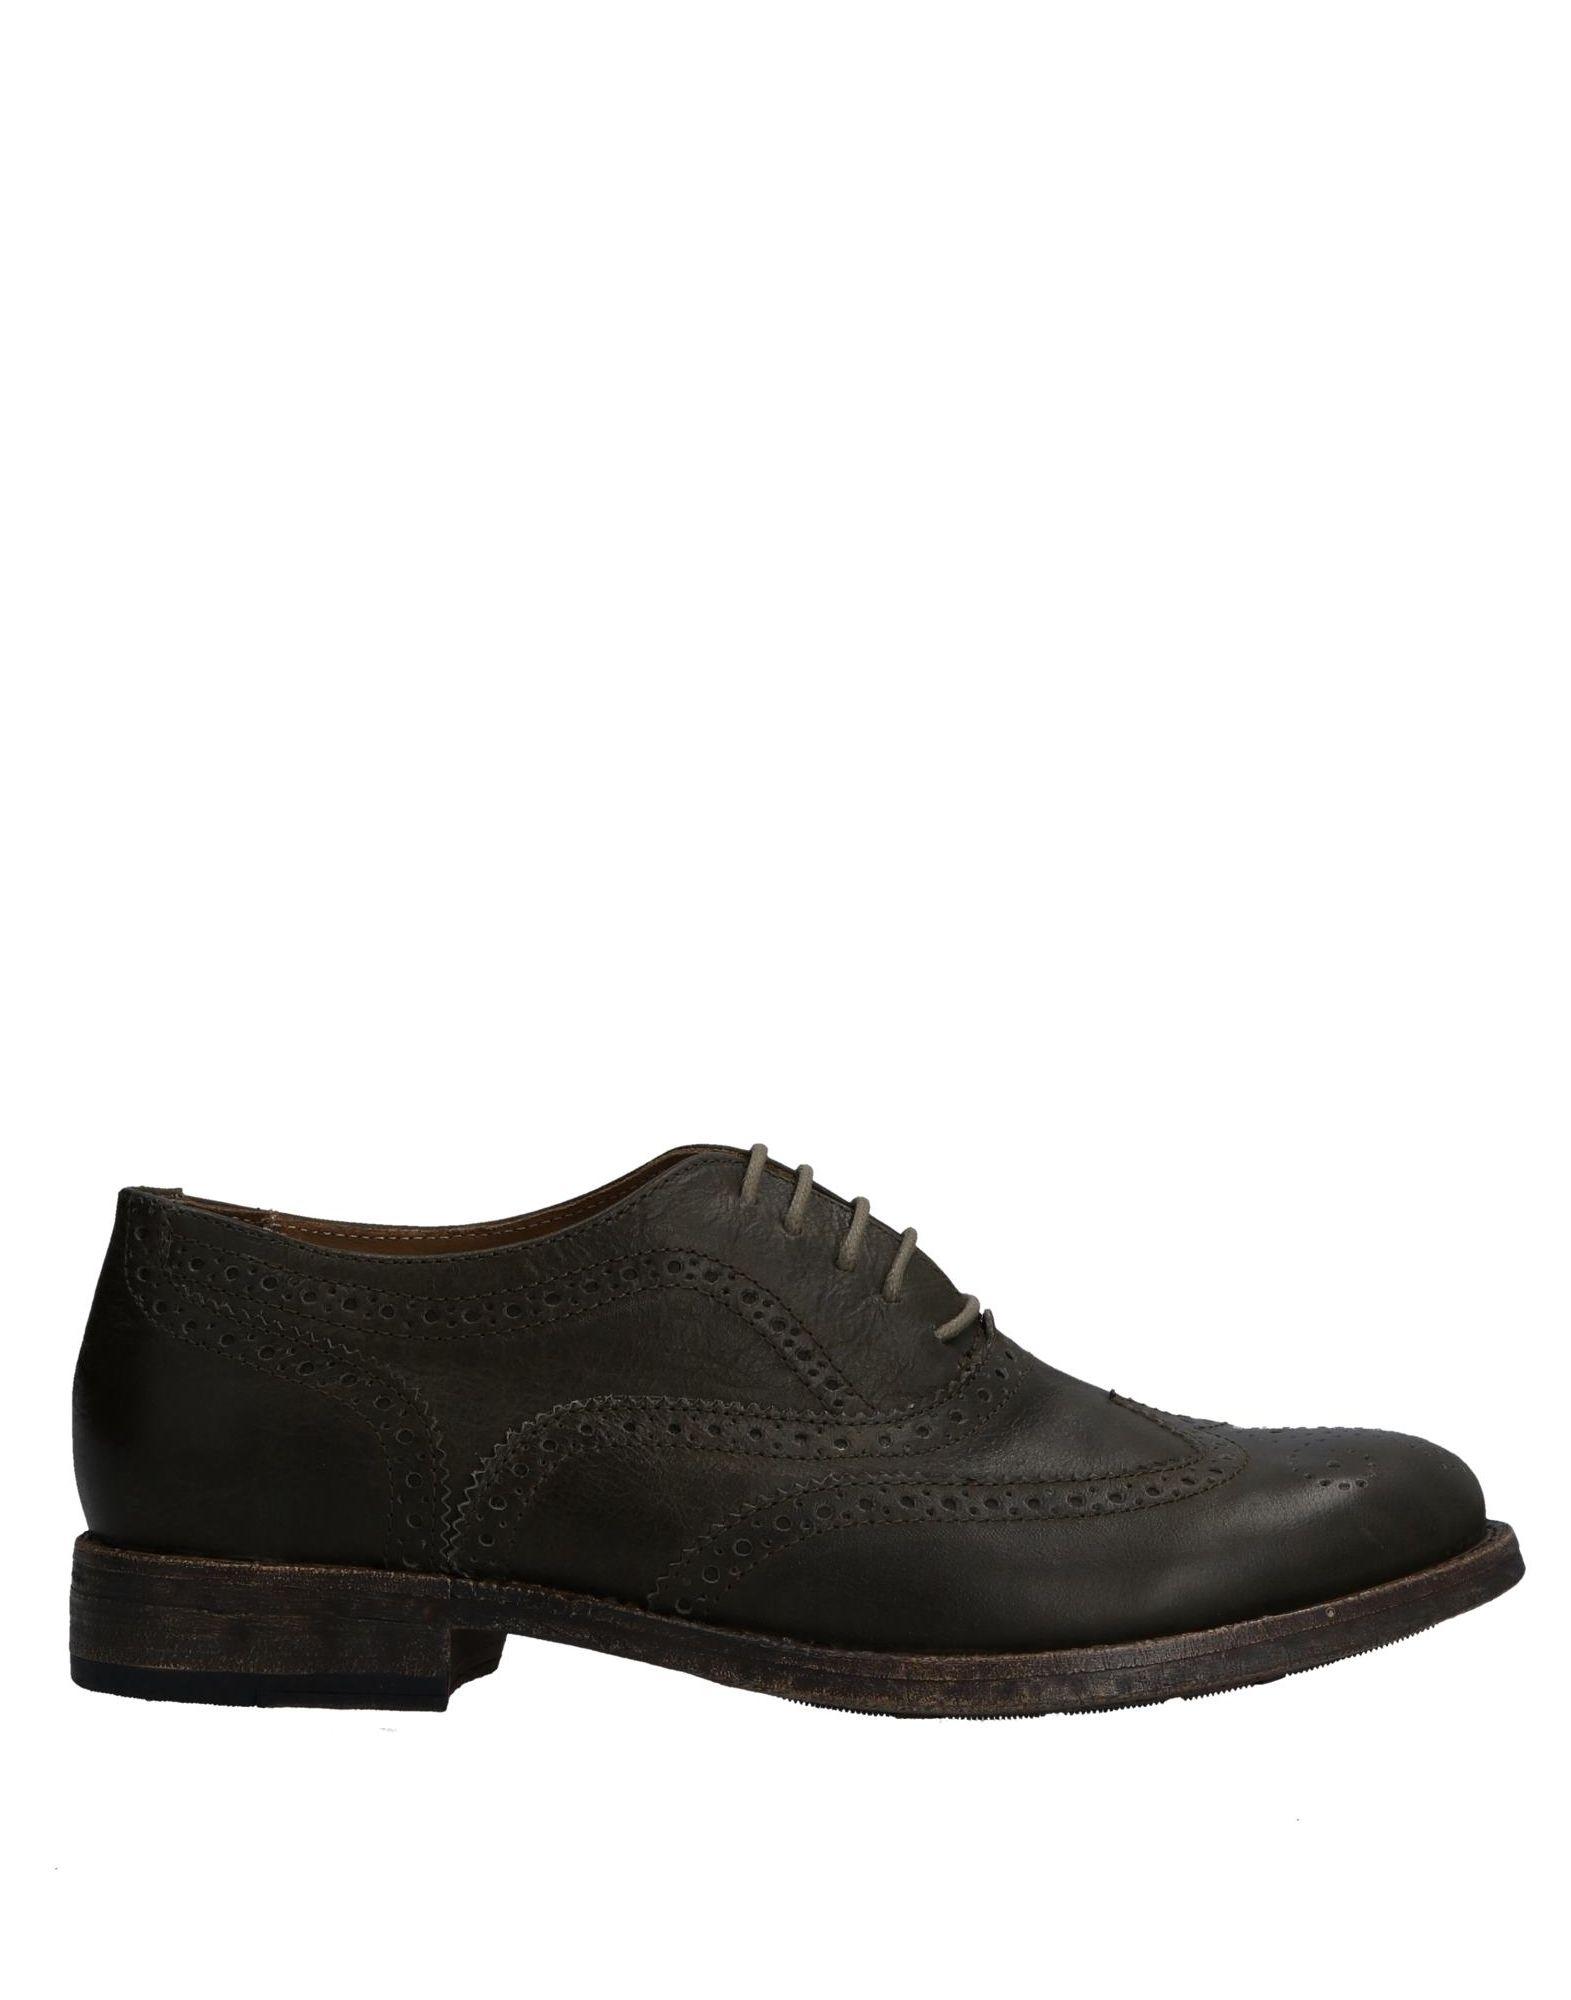 SNOBS® Обувь на шнурках обувь обувь обувь обувь обувь обувь обувь обувь обувь обувь обувь обувь обувь обувь обувь мужская обувь обувь 3603 темно синяя 40 метров